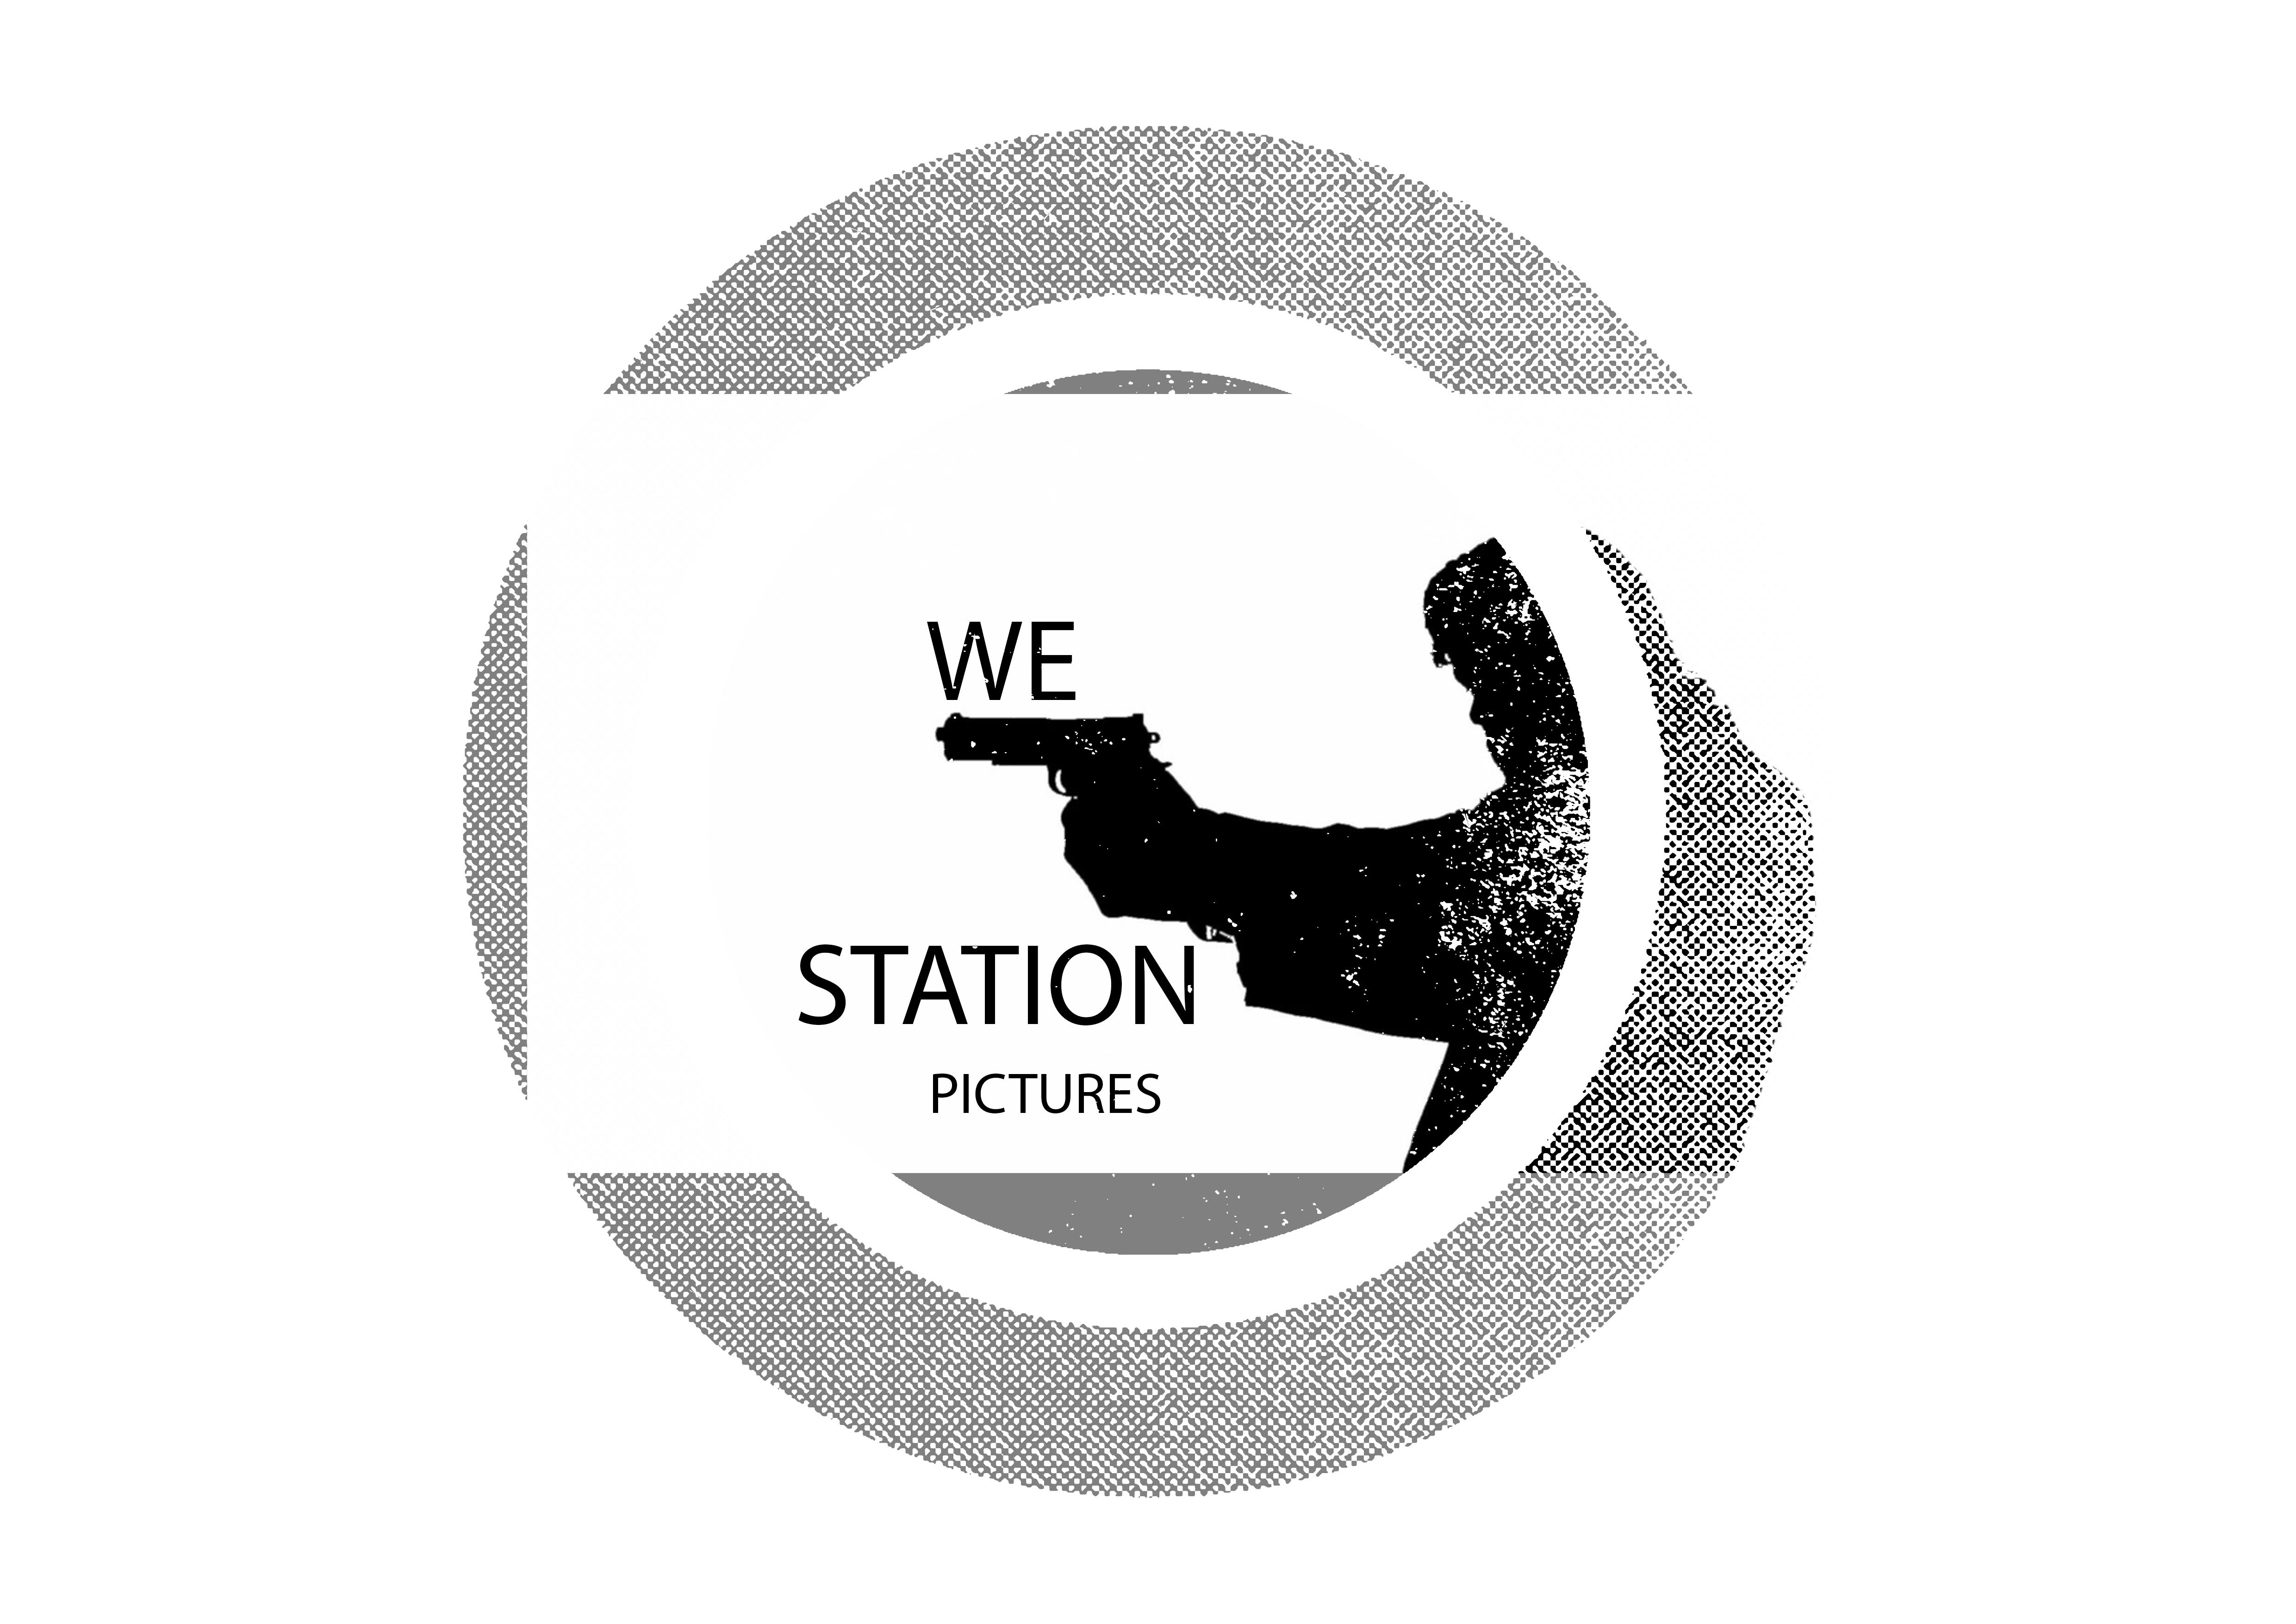 WE STATION ShooterPICT LOGOFULL